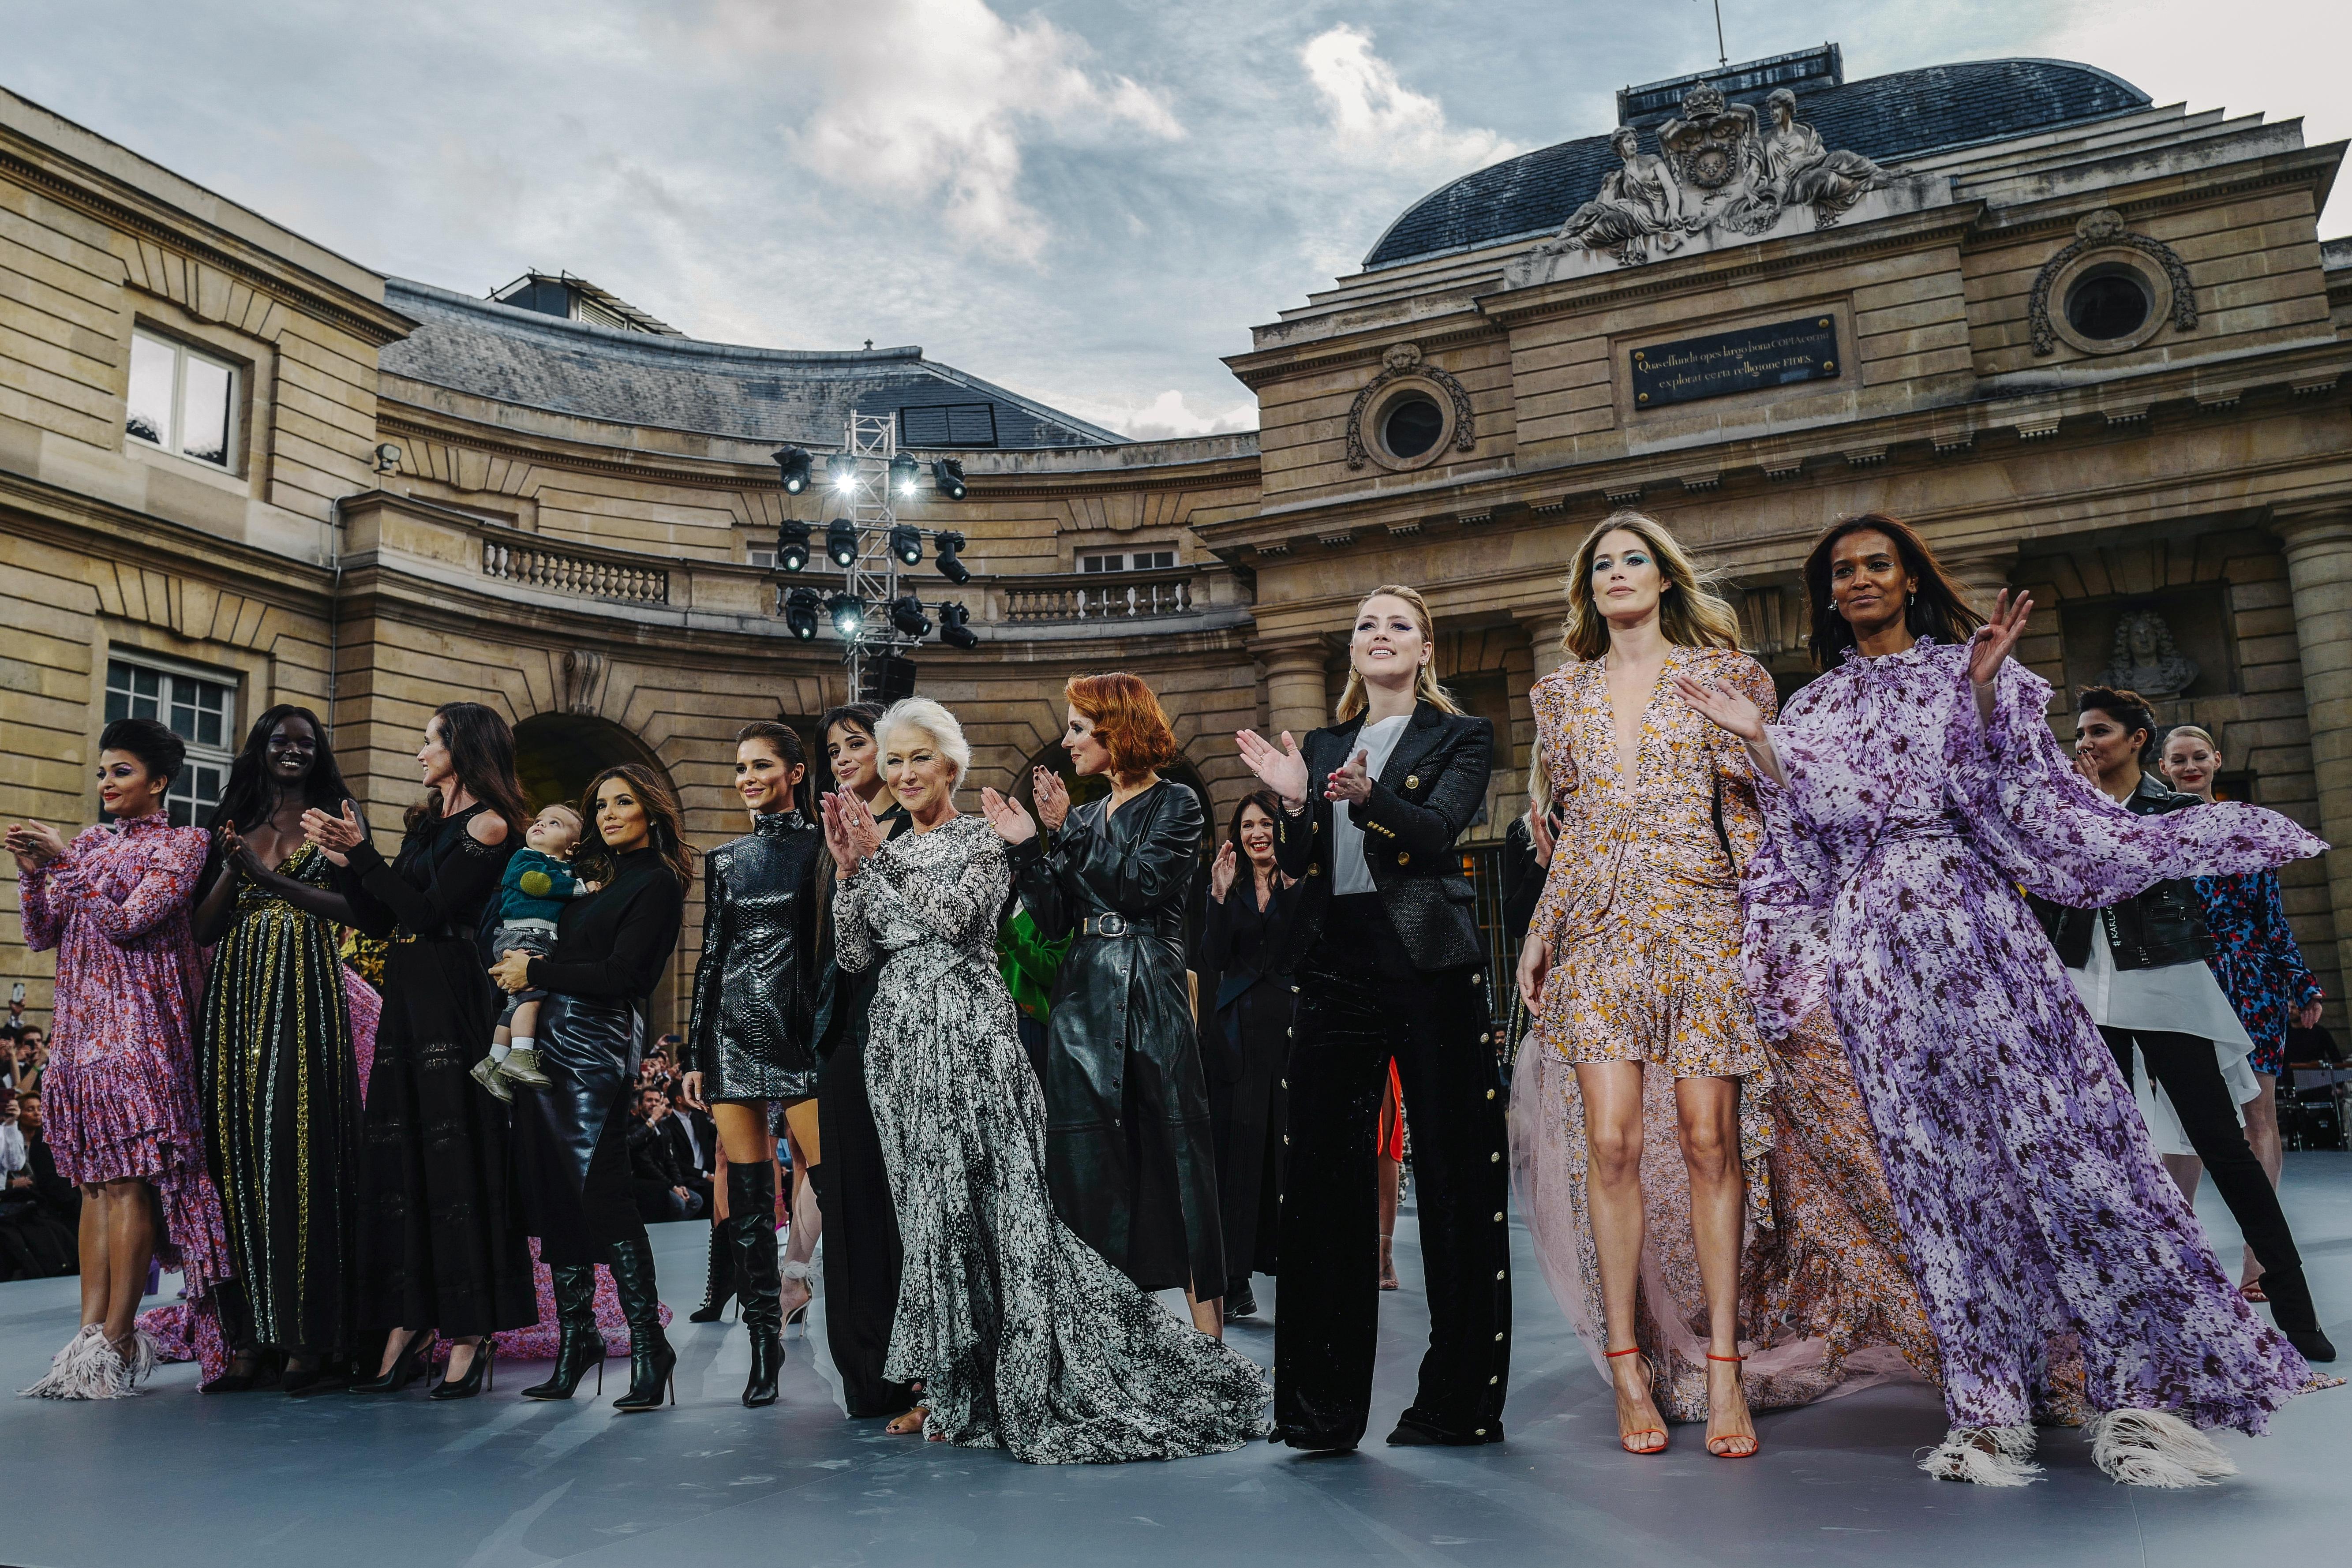 L'Oreal celebrates female empowerment with glamorous runway show